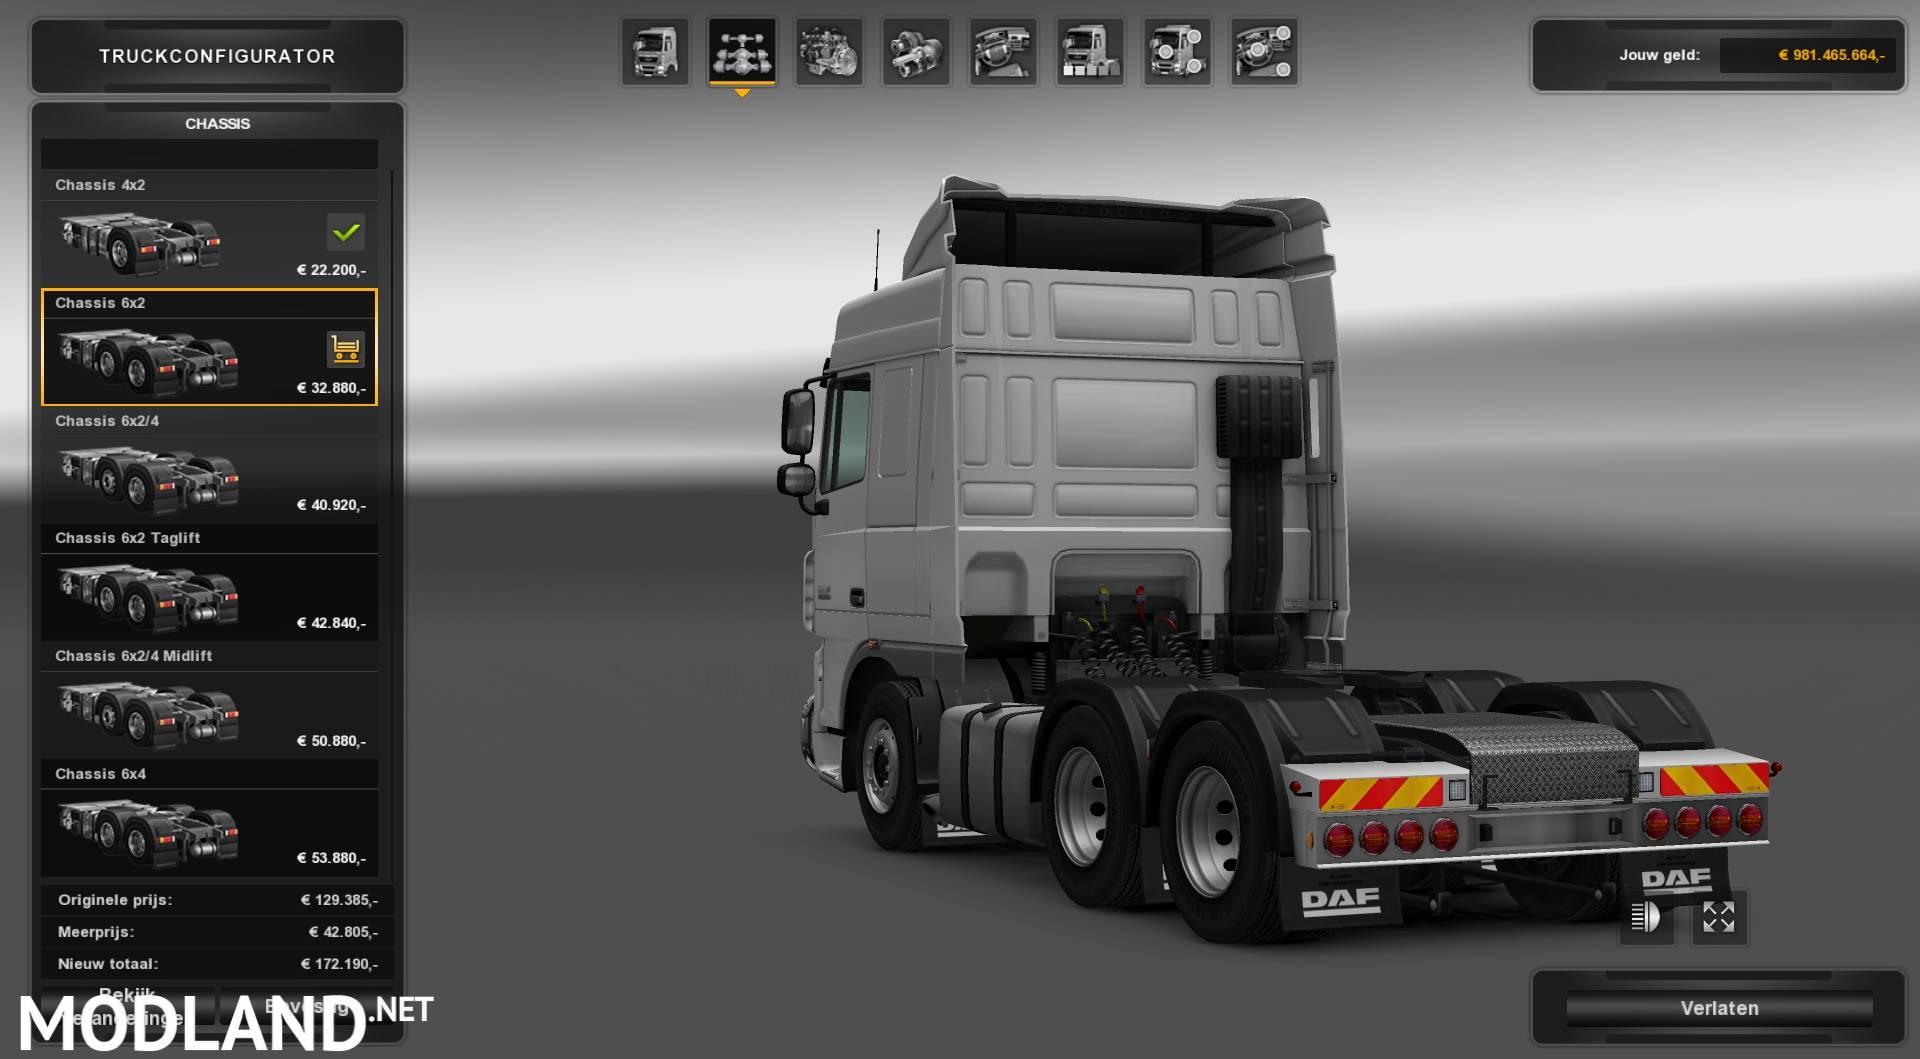 Euro truck simulator 2 multiplayer full version